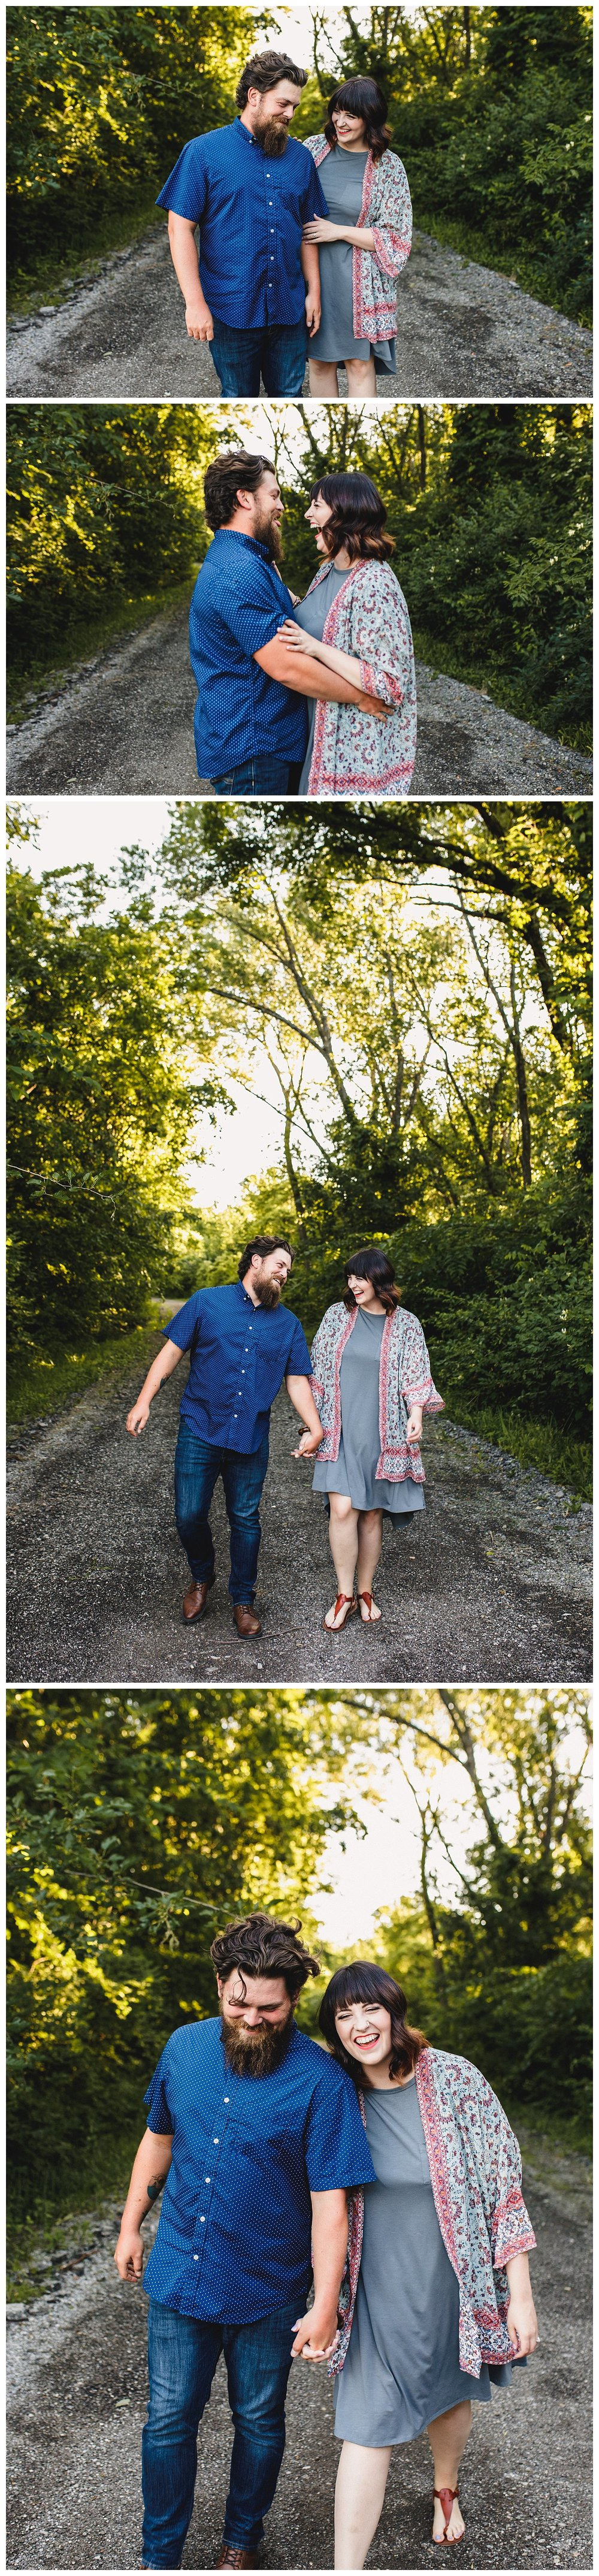 Kelsey_Diane_Photography_Kansas_City_Engagement_Wedding_Photographer_Midwest_Traveling_Missouri_Chris_Taylor_0763.jpg